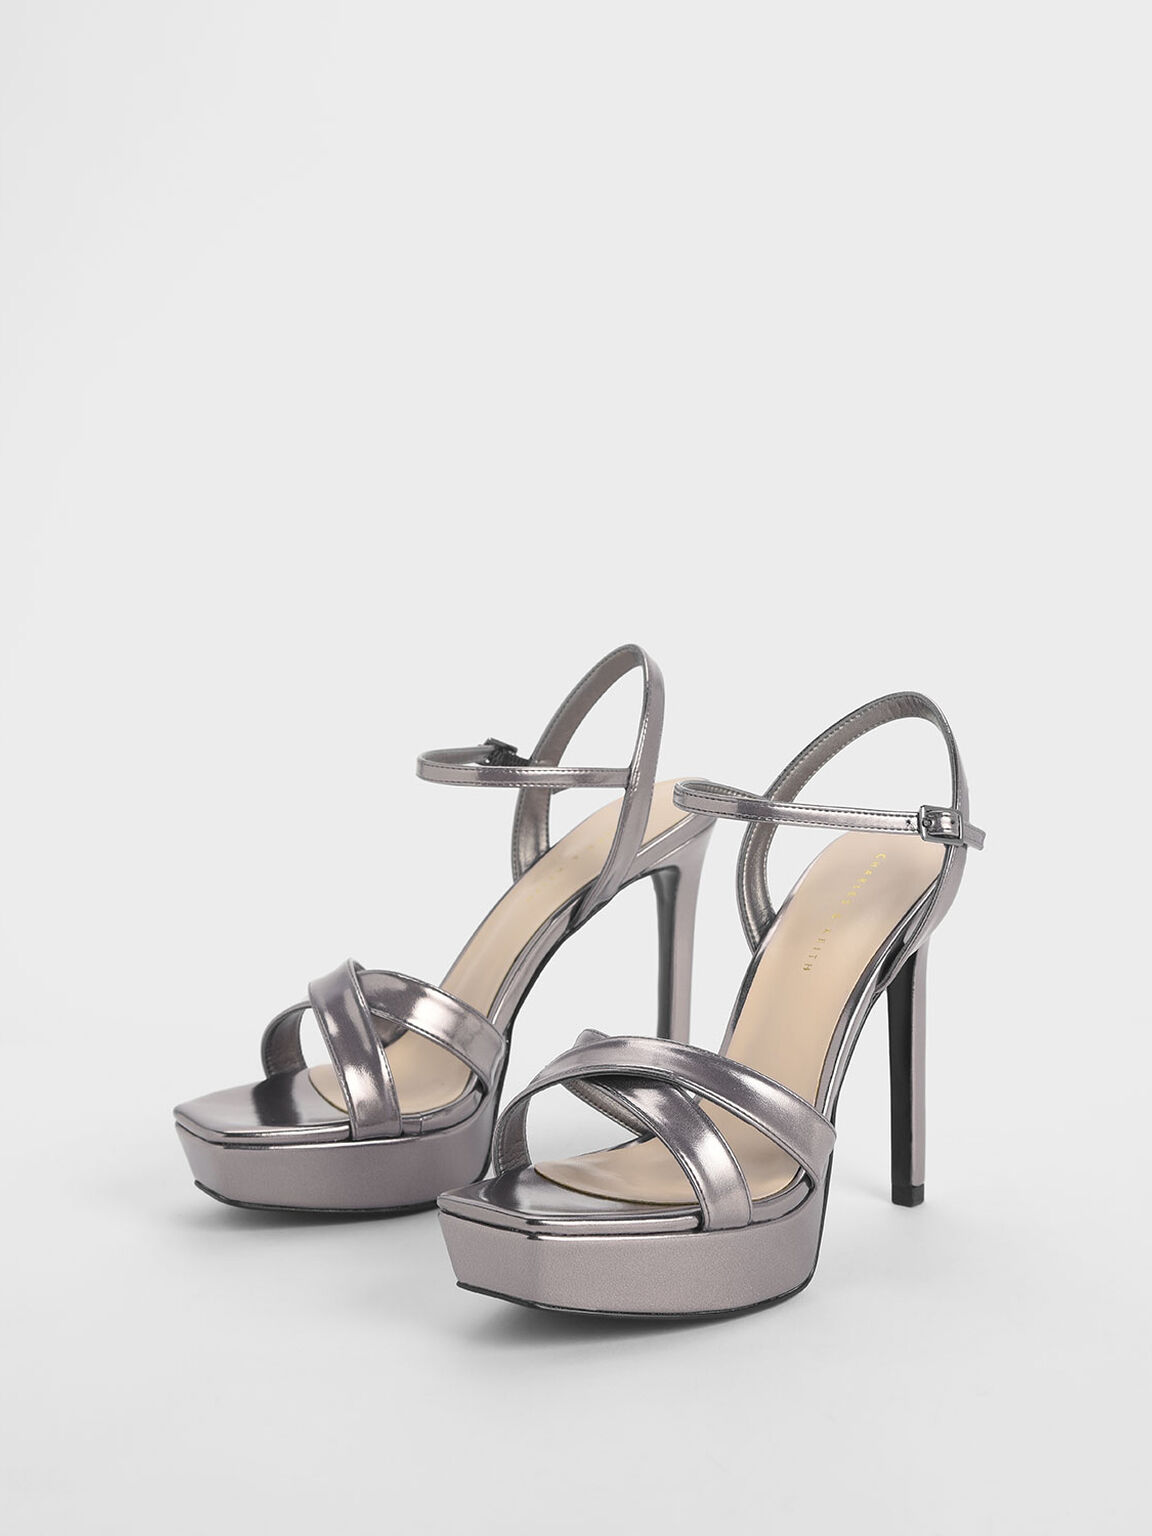 Criss Cross Ankle Strap Metallic Platform Heels, Pewter, hi-res